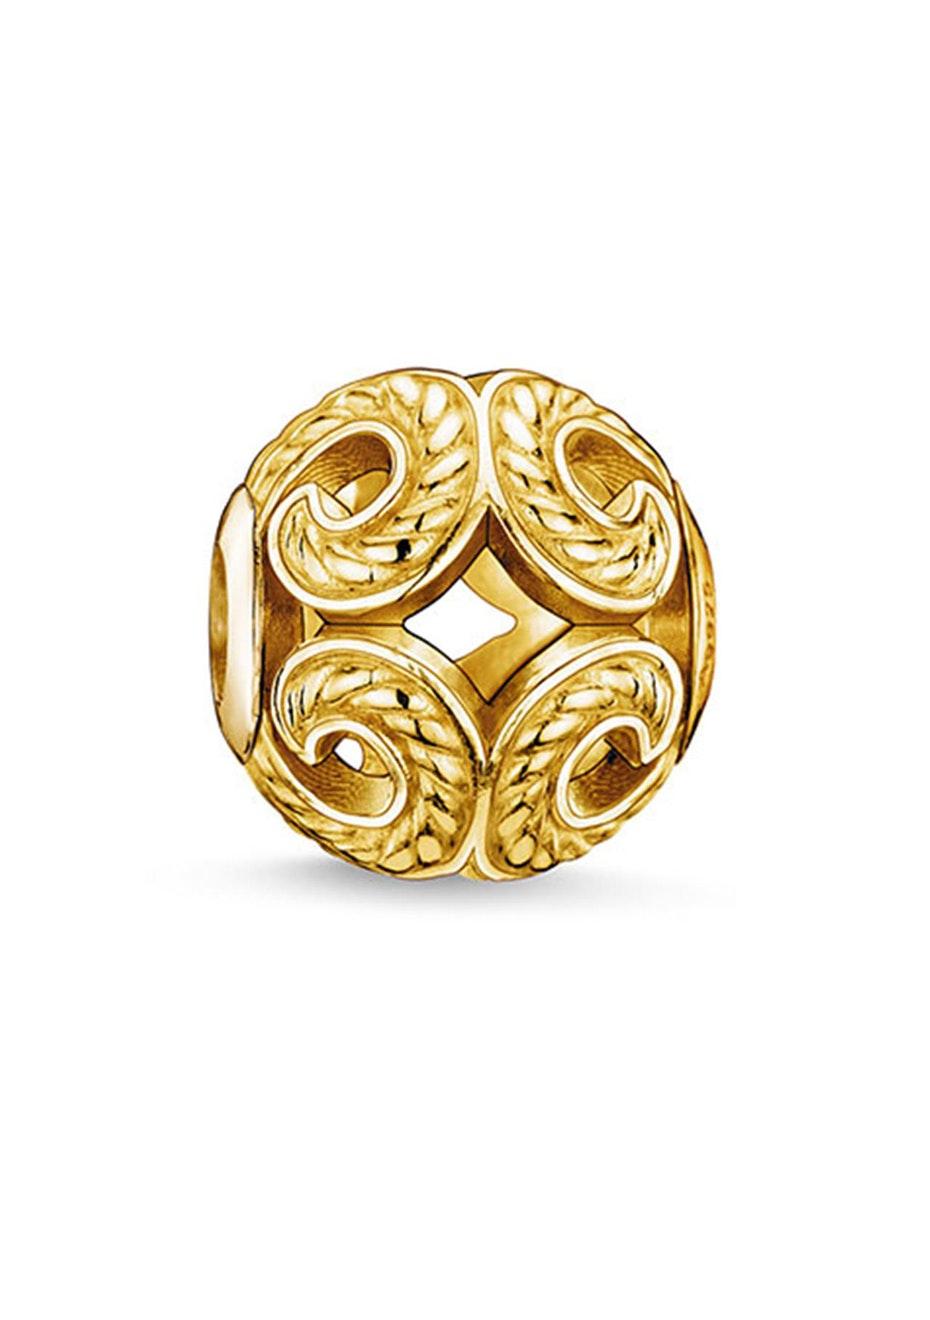 Thomas Sabo  - Karma Bead - Yellow Gold Plated Wave